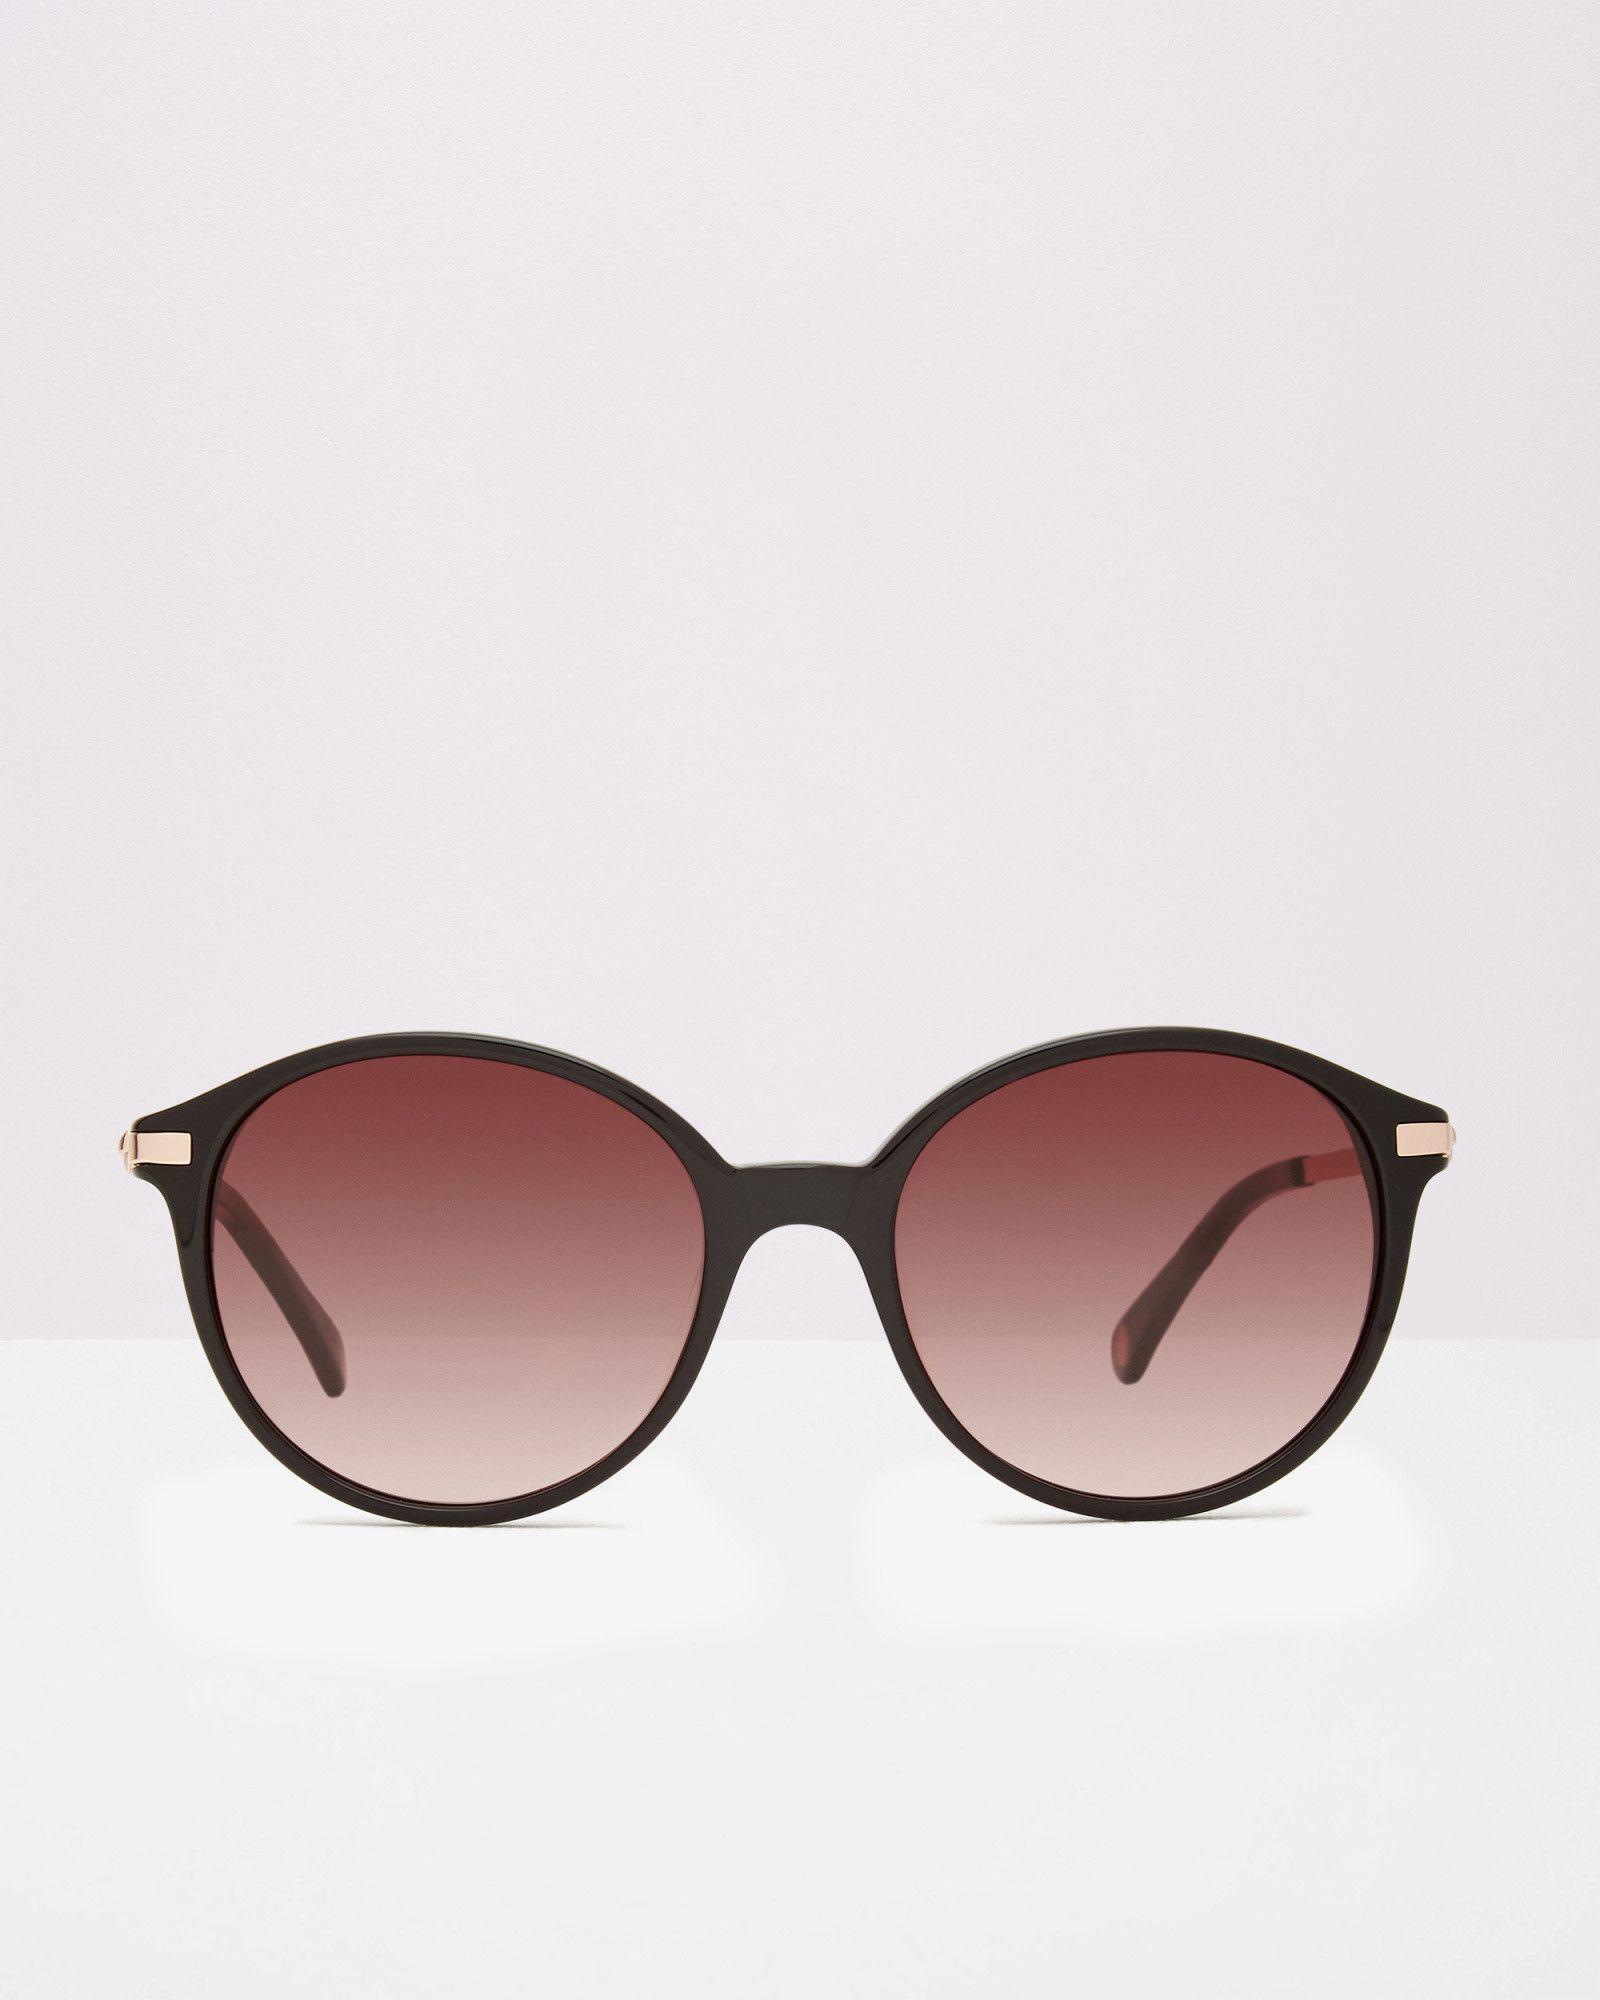 dfa29e179 Ted Baker Round metallic sunglasses Black